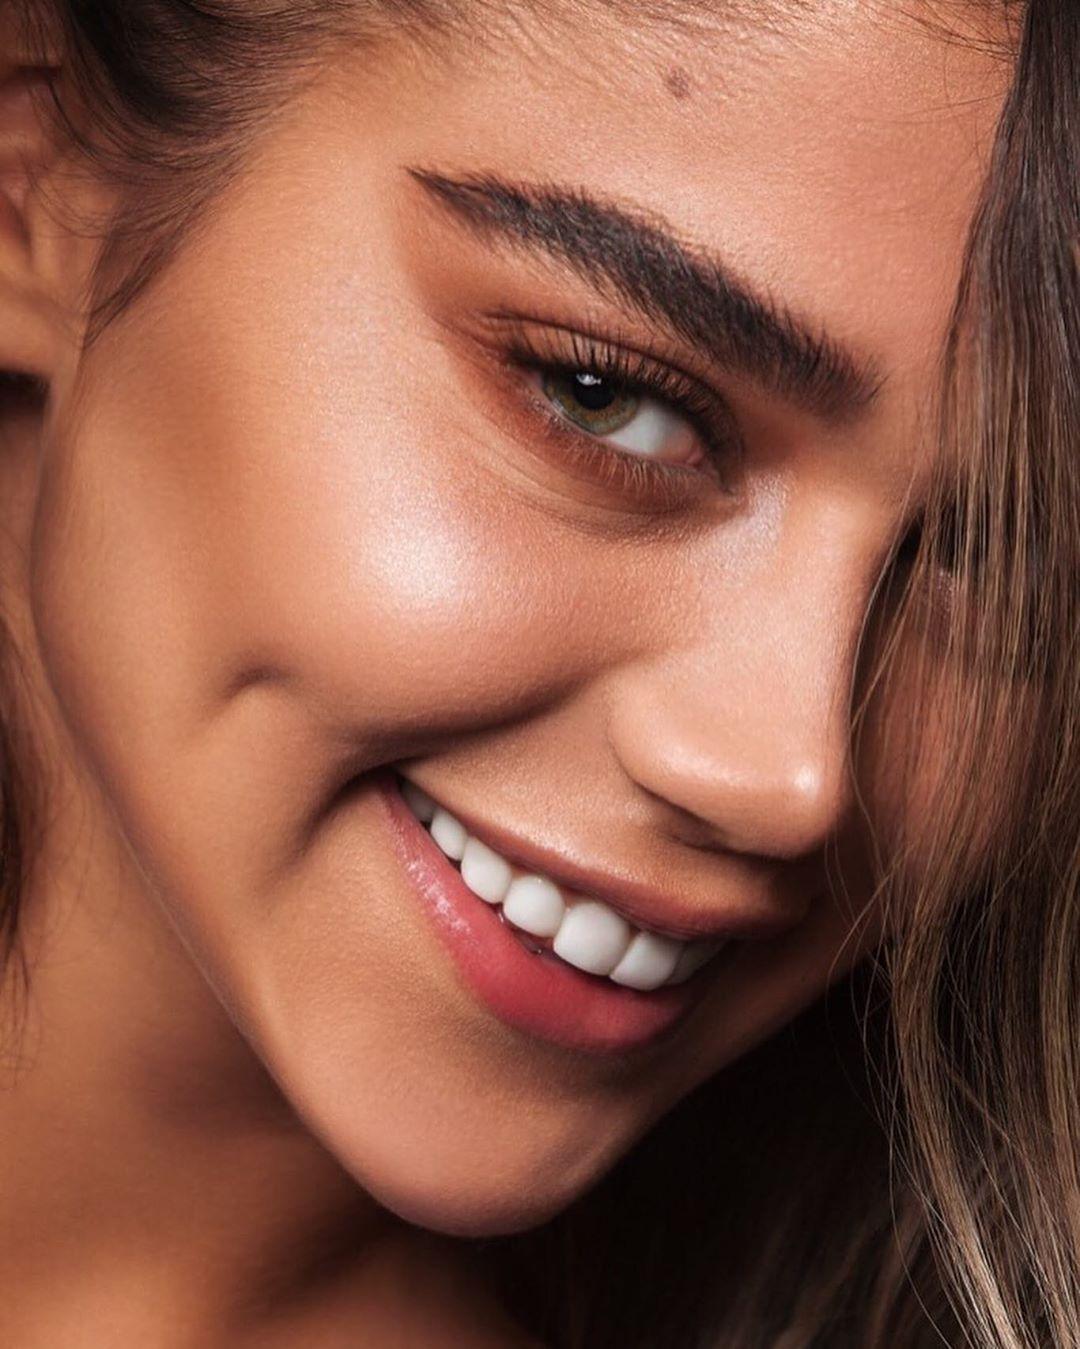 Pin On Tutorials Makeup 60 S Vintage Blackand White Cosmetics Velvet Lipstick Eyeshadow Beautylooks Makeupnomakeup 70 S 80 S 90 S 50